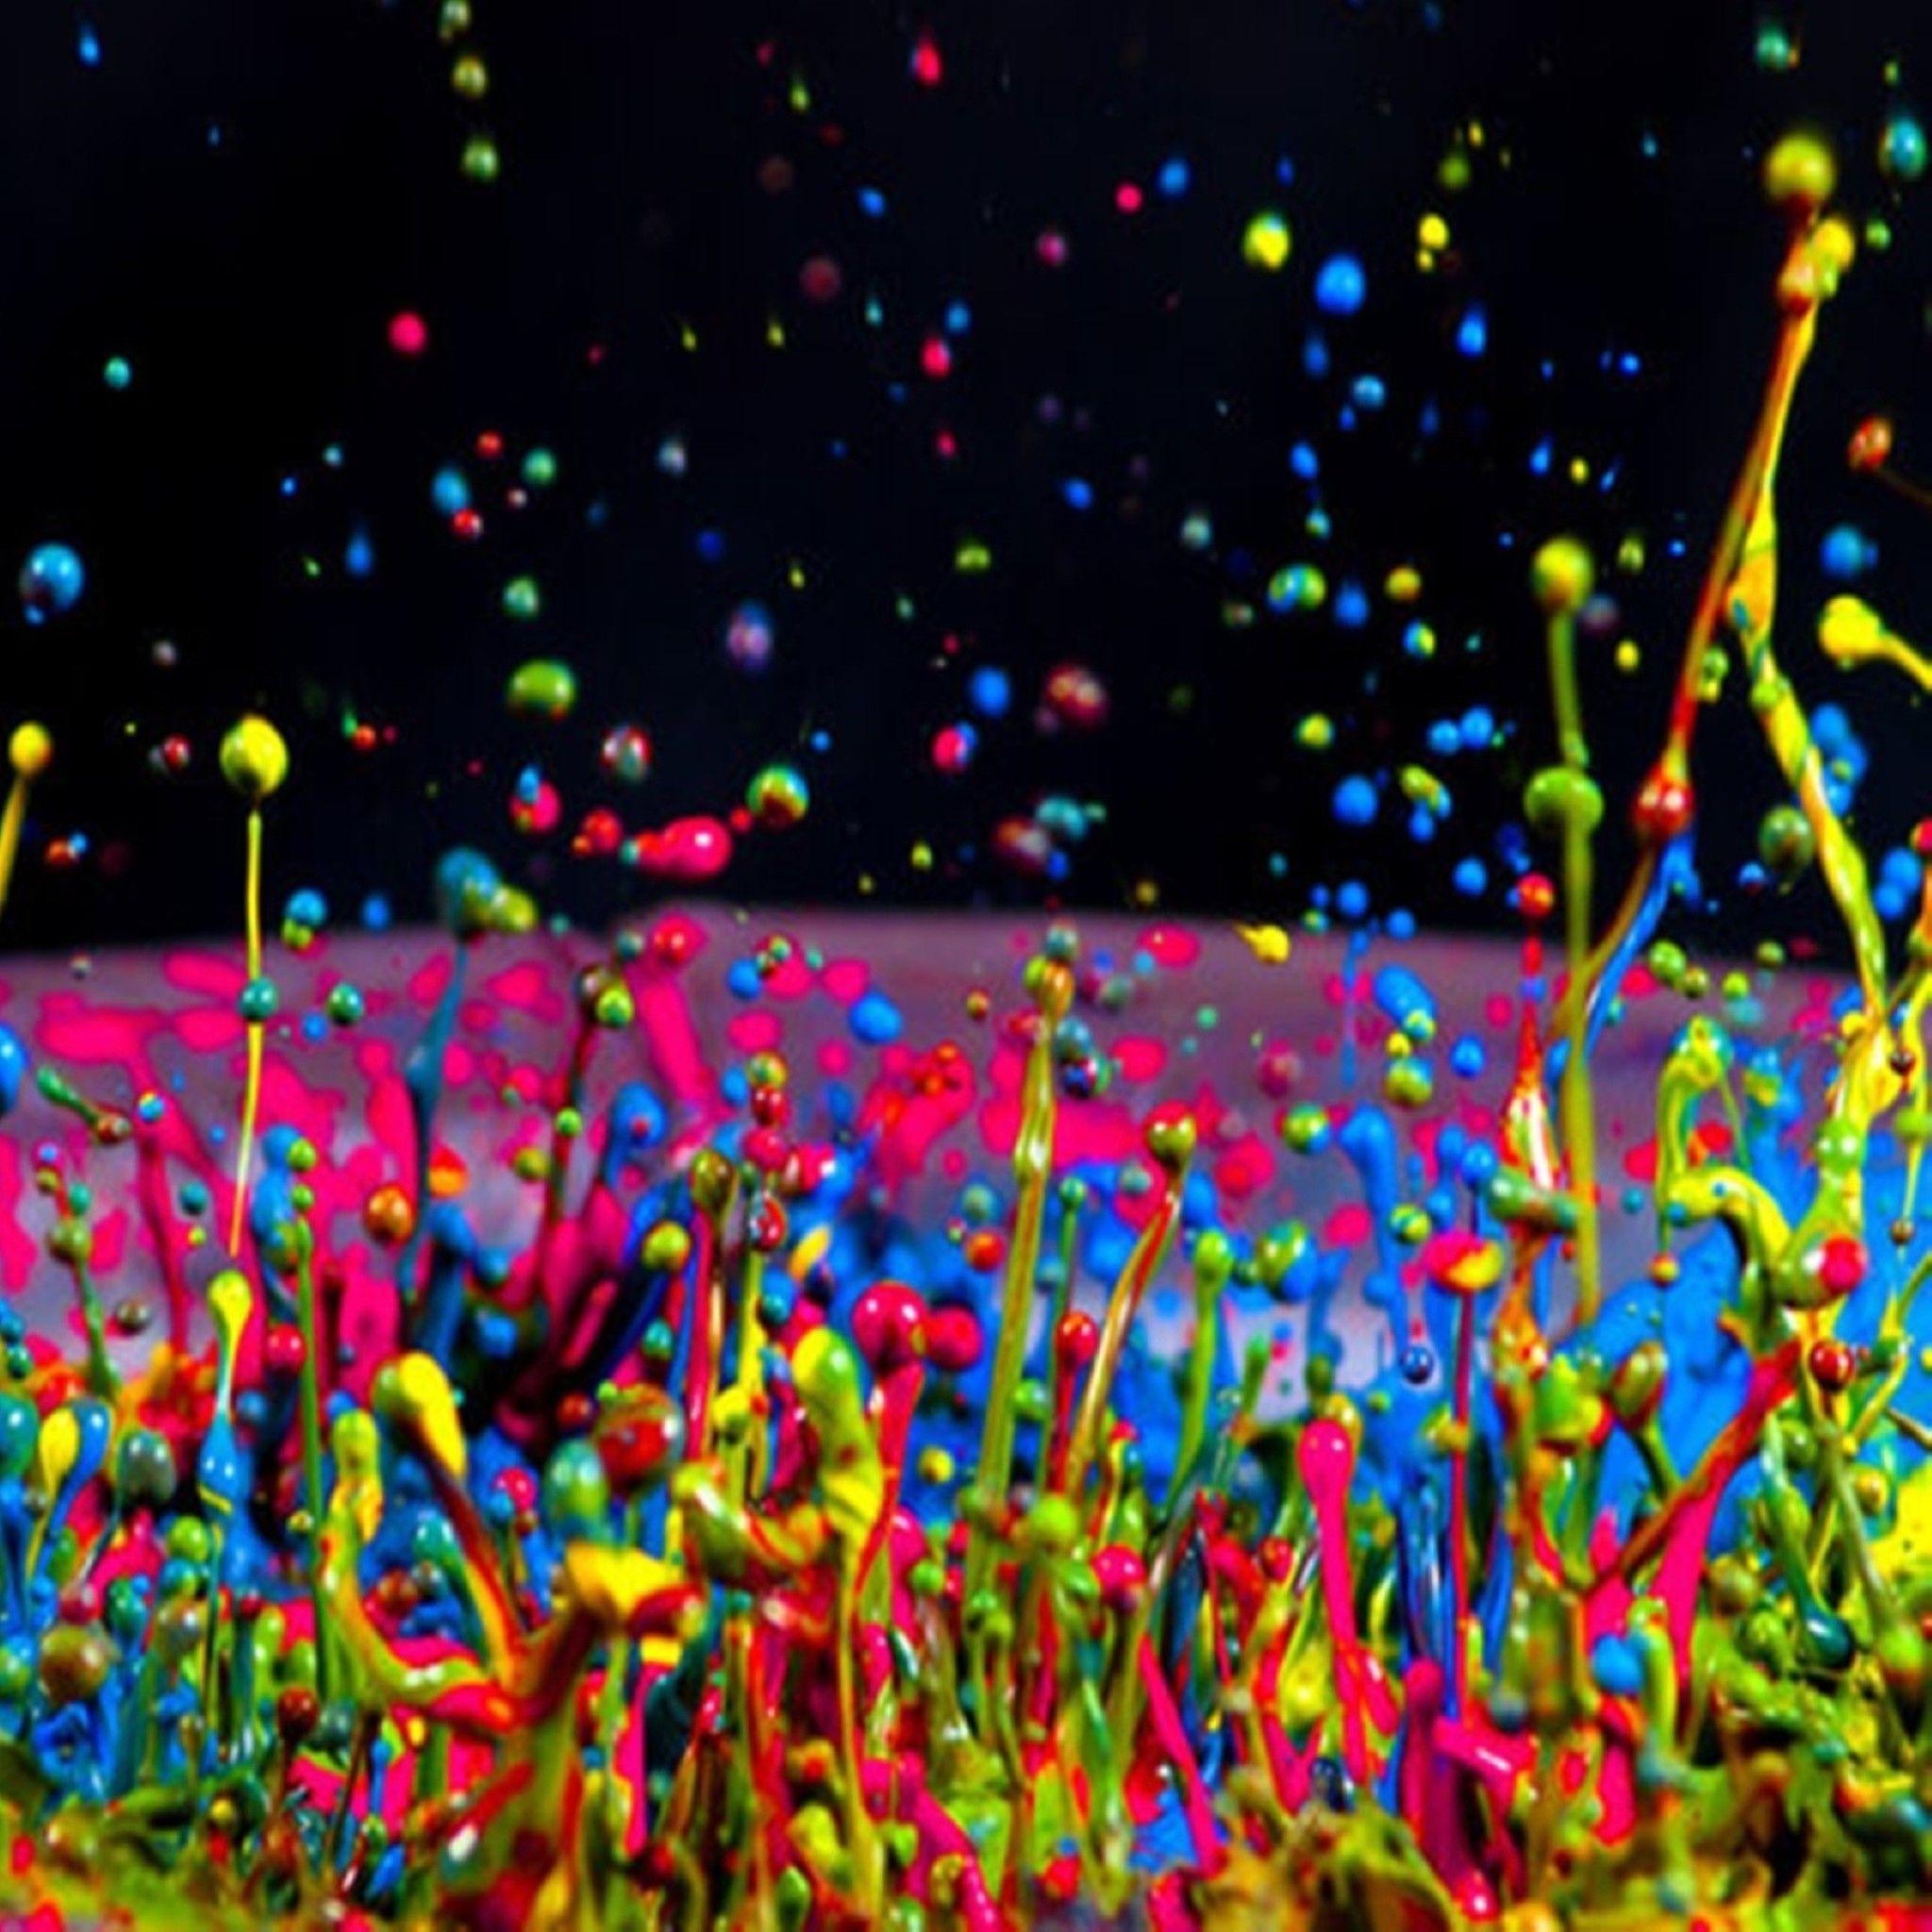 Live Wallpaper For Ipad Wallpapersafari Rainbow Painting Neon Painting Color Splash